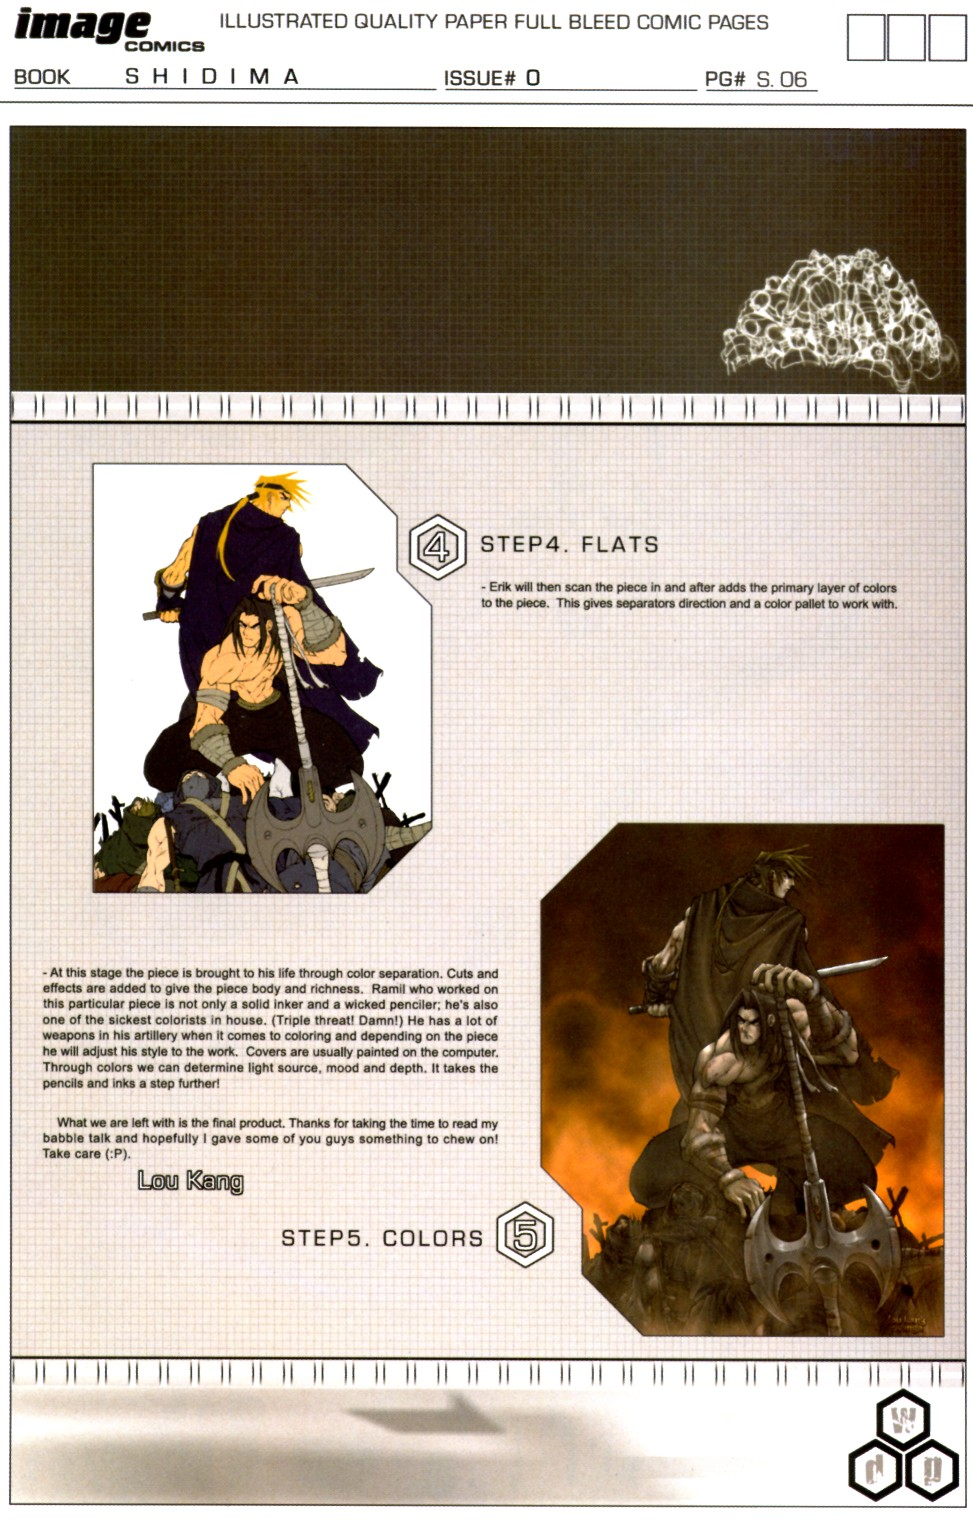 Read online Shidima comic -  Issue #0 - 19